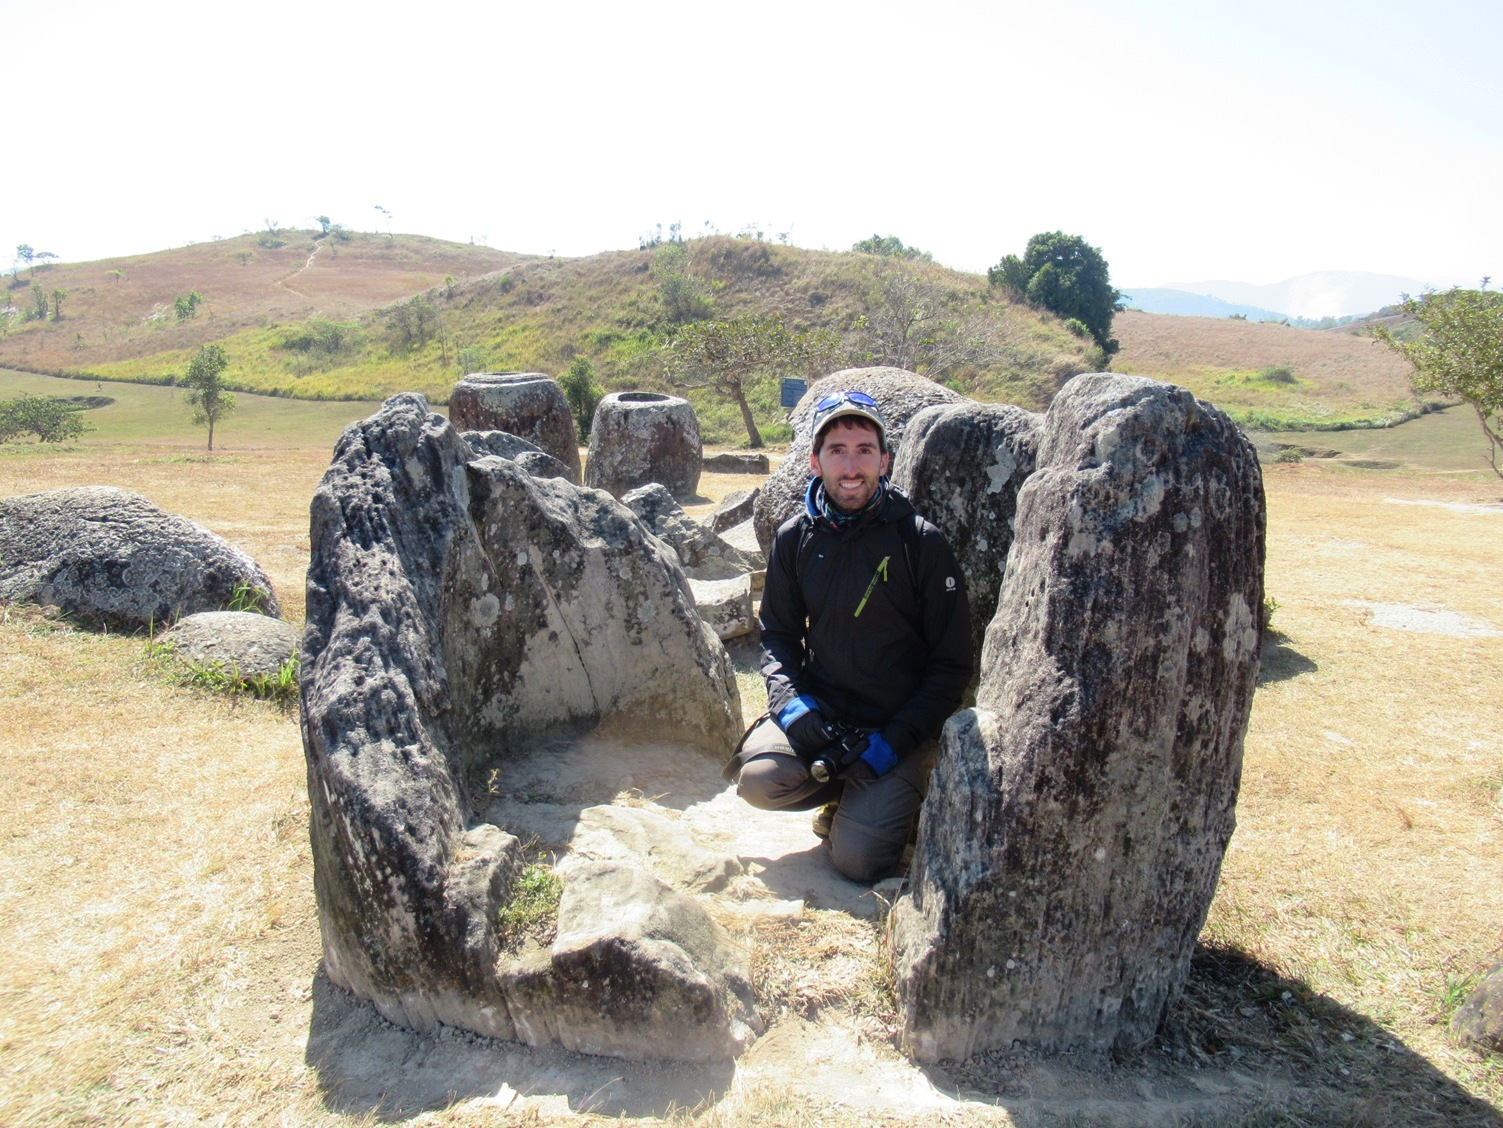 2019-12-laos-luang-phonsavan-xieng-khouang-plain-of-jars-sitio-1-06